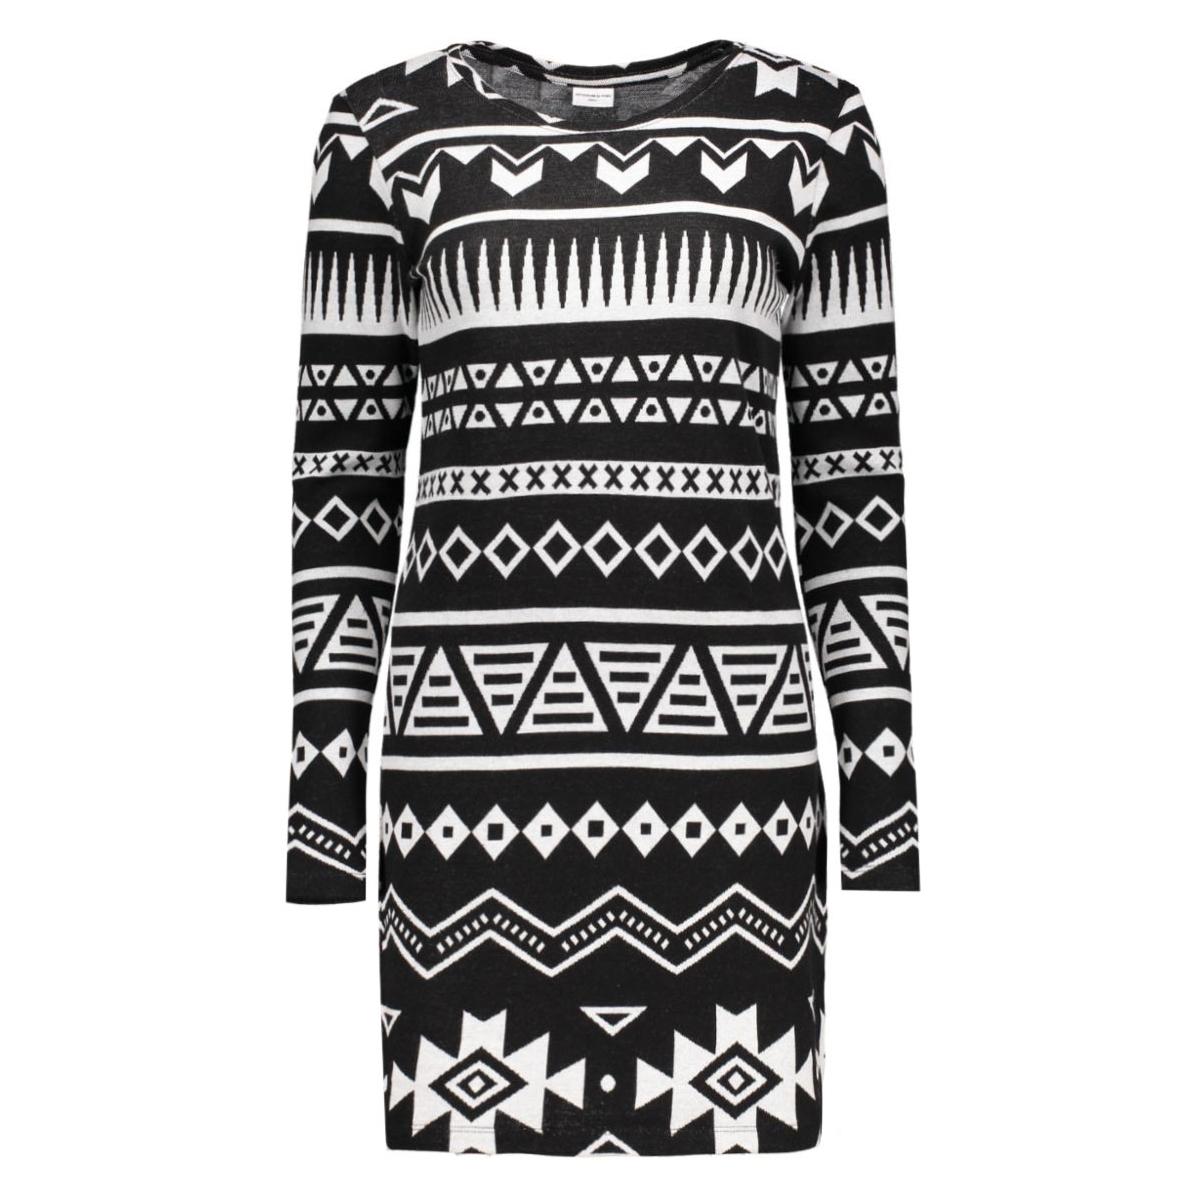 jdygetty l/s dress jrs 15123521 jacqueline de yong jurk black/getty aztek